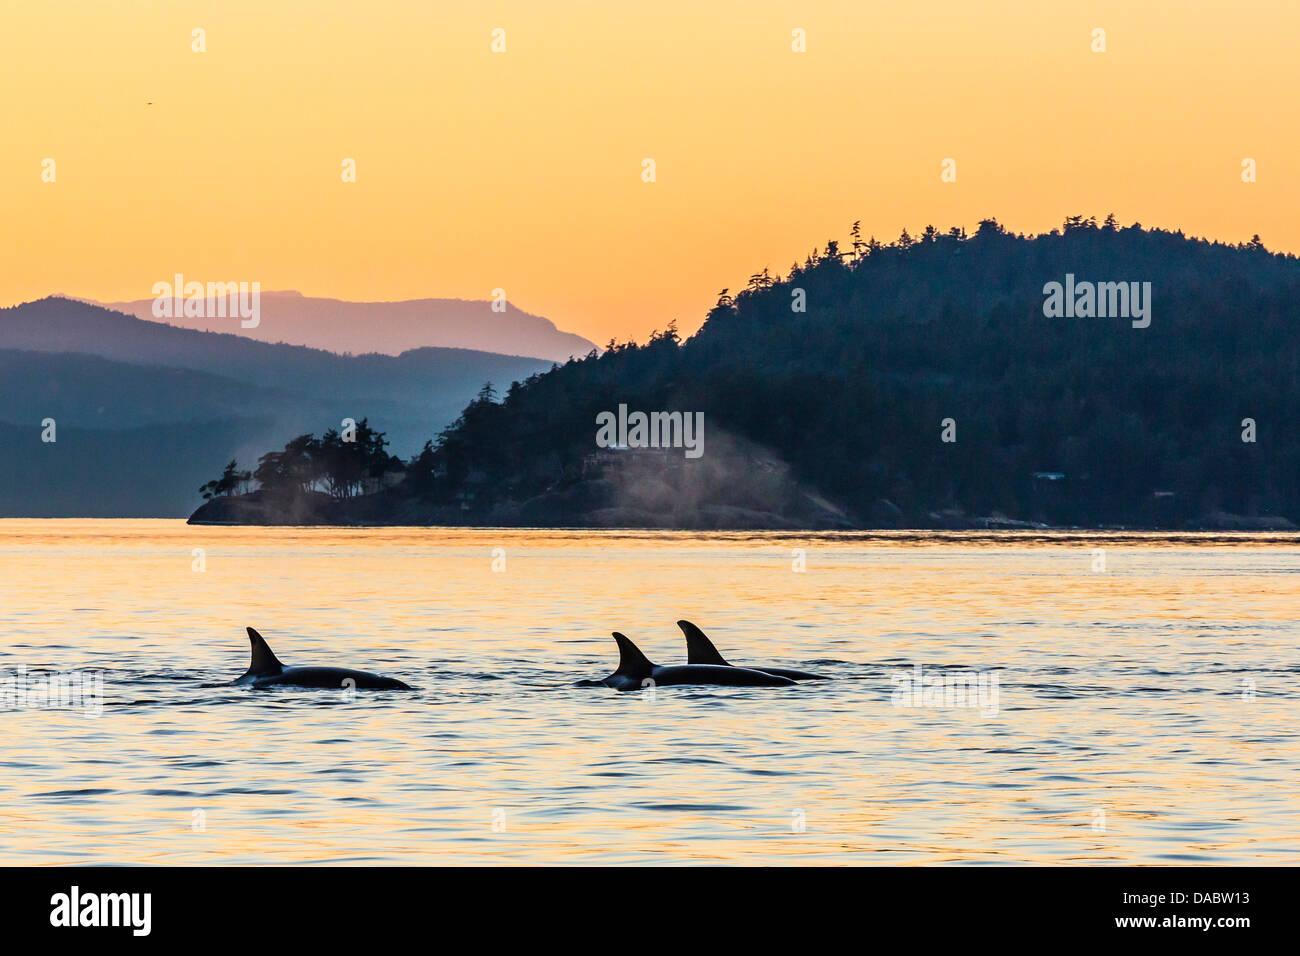 Transient killer whales (Orcinus orca) surfacing at sunset, Haro Strait, Saturna Island, British Columbia, Canada, - Stock Image